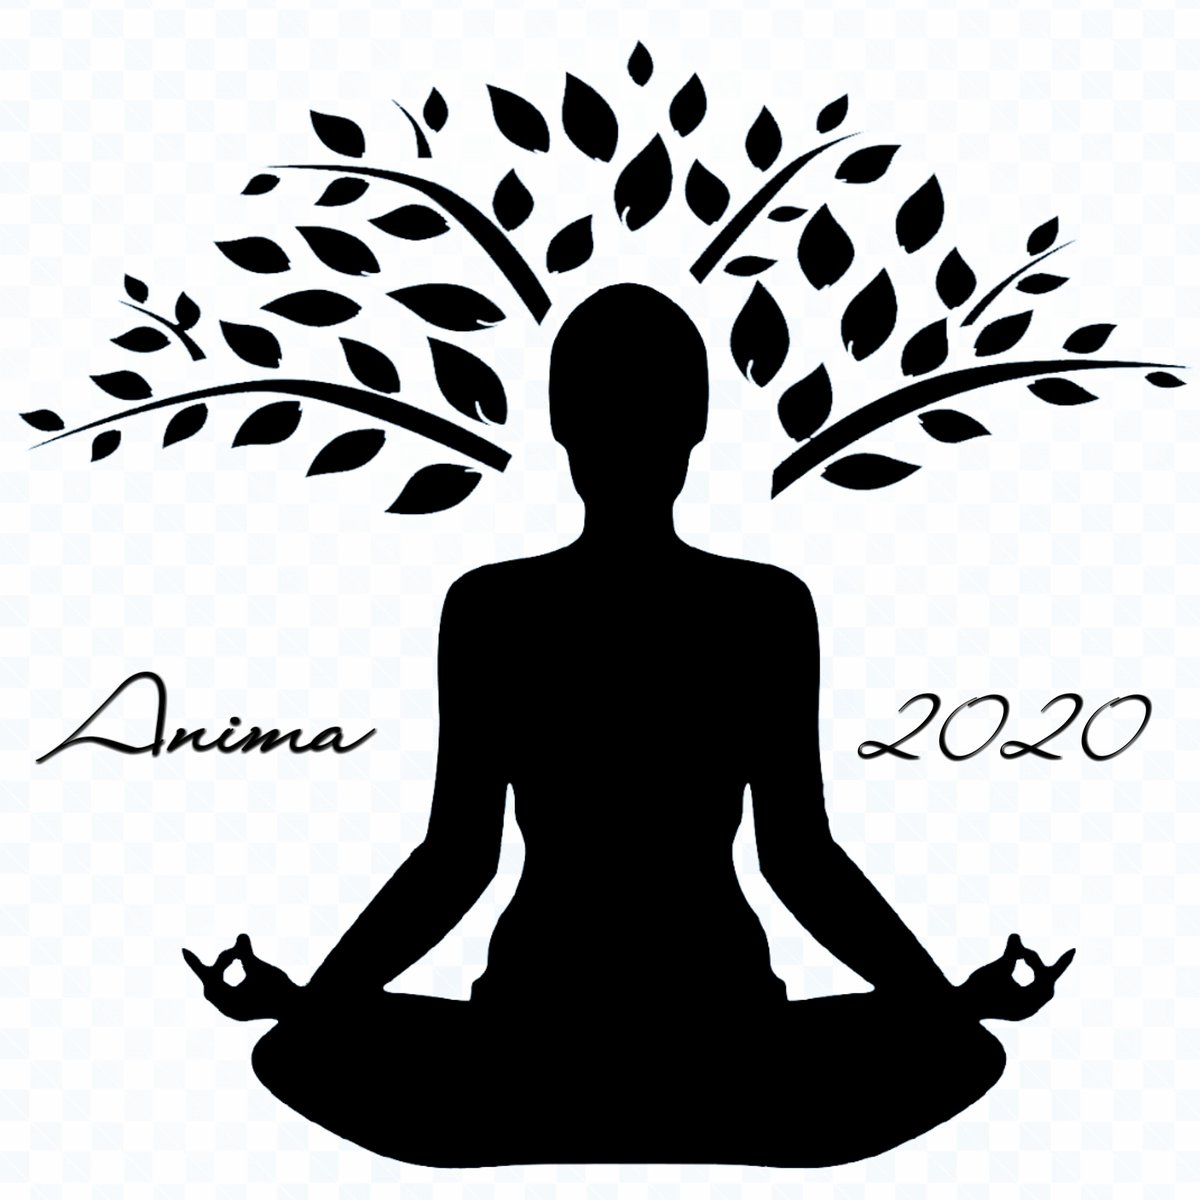 #anima #soul #reiki #energy #healing #alternativemedicine #love #light #reikihealing #anotherway #reikimaster pic.twitter.com/fgxBLOn2up